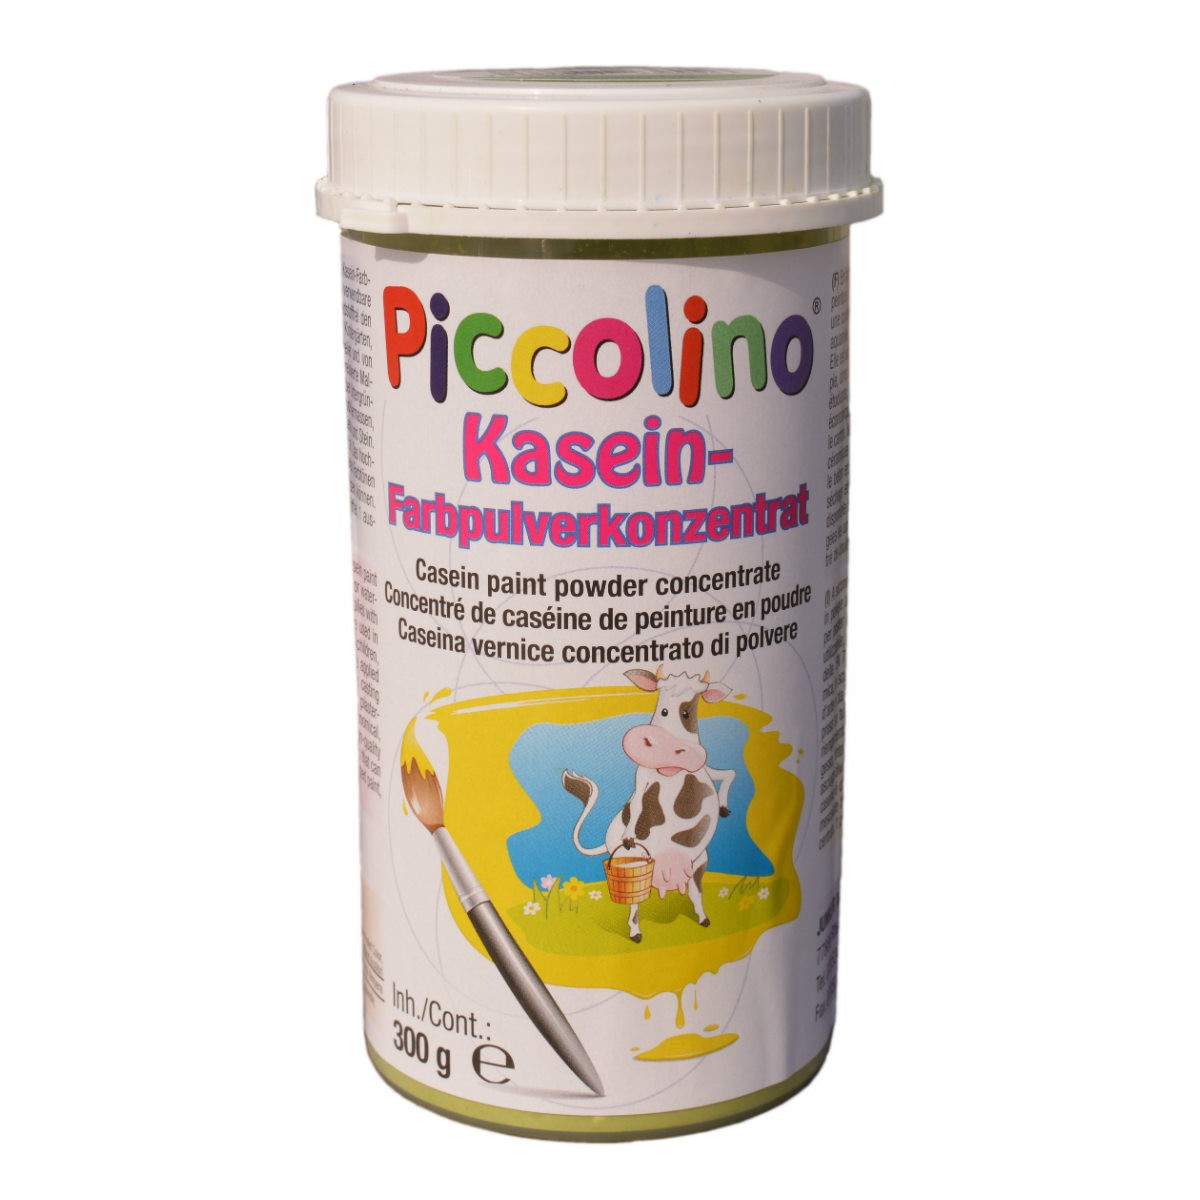 Plakatfarbe Piccolino Kaseinfarbe 300g zitronengelb - Farbpulver zum Selbstanrühren